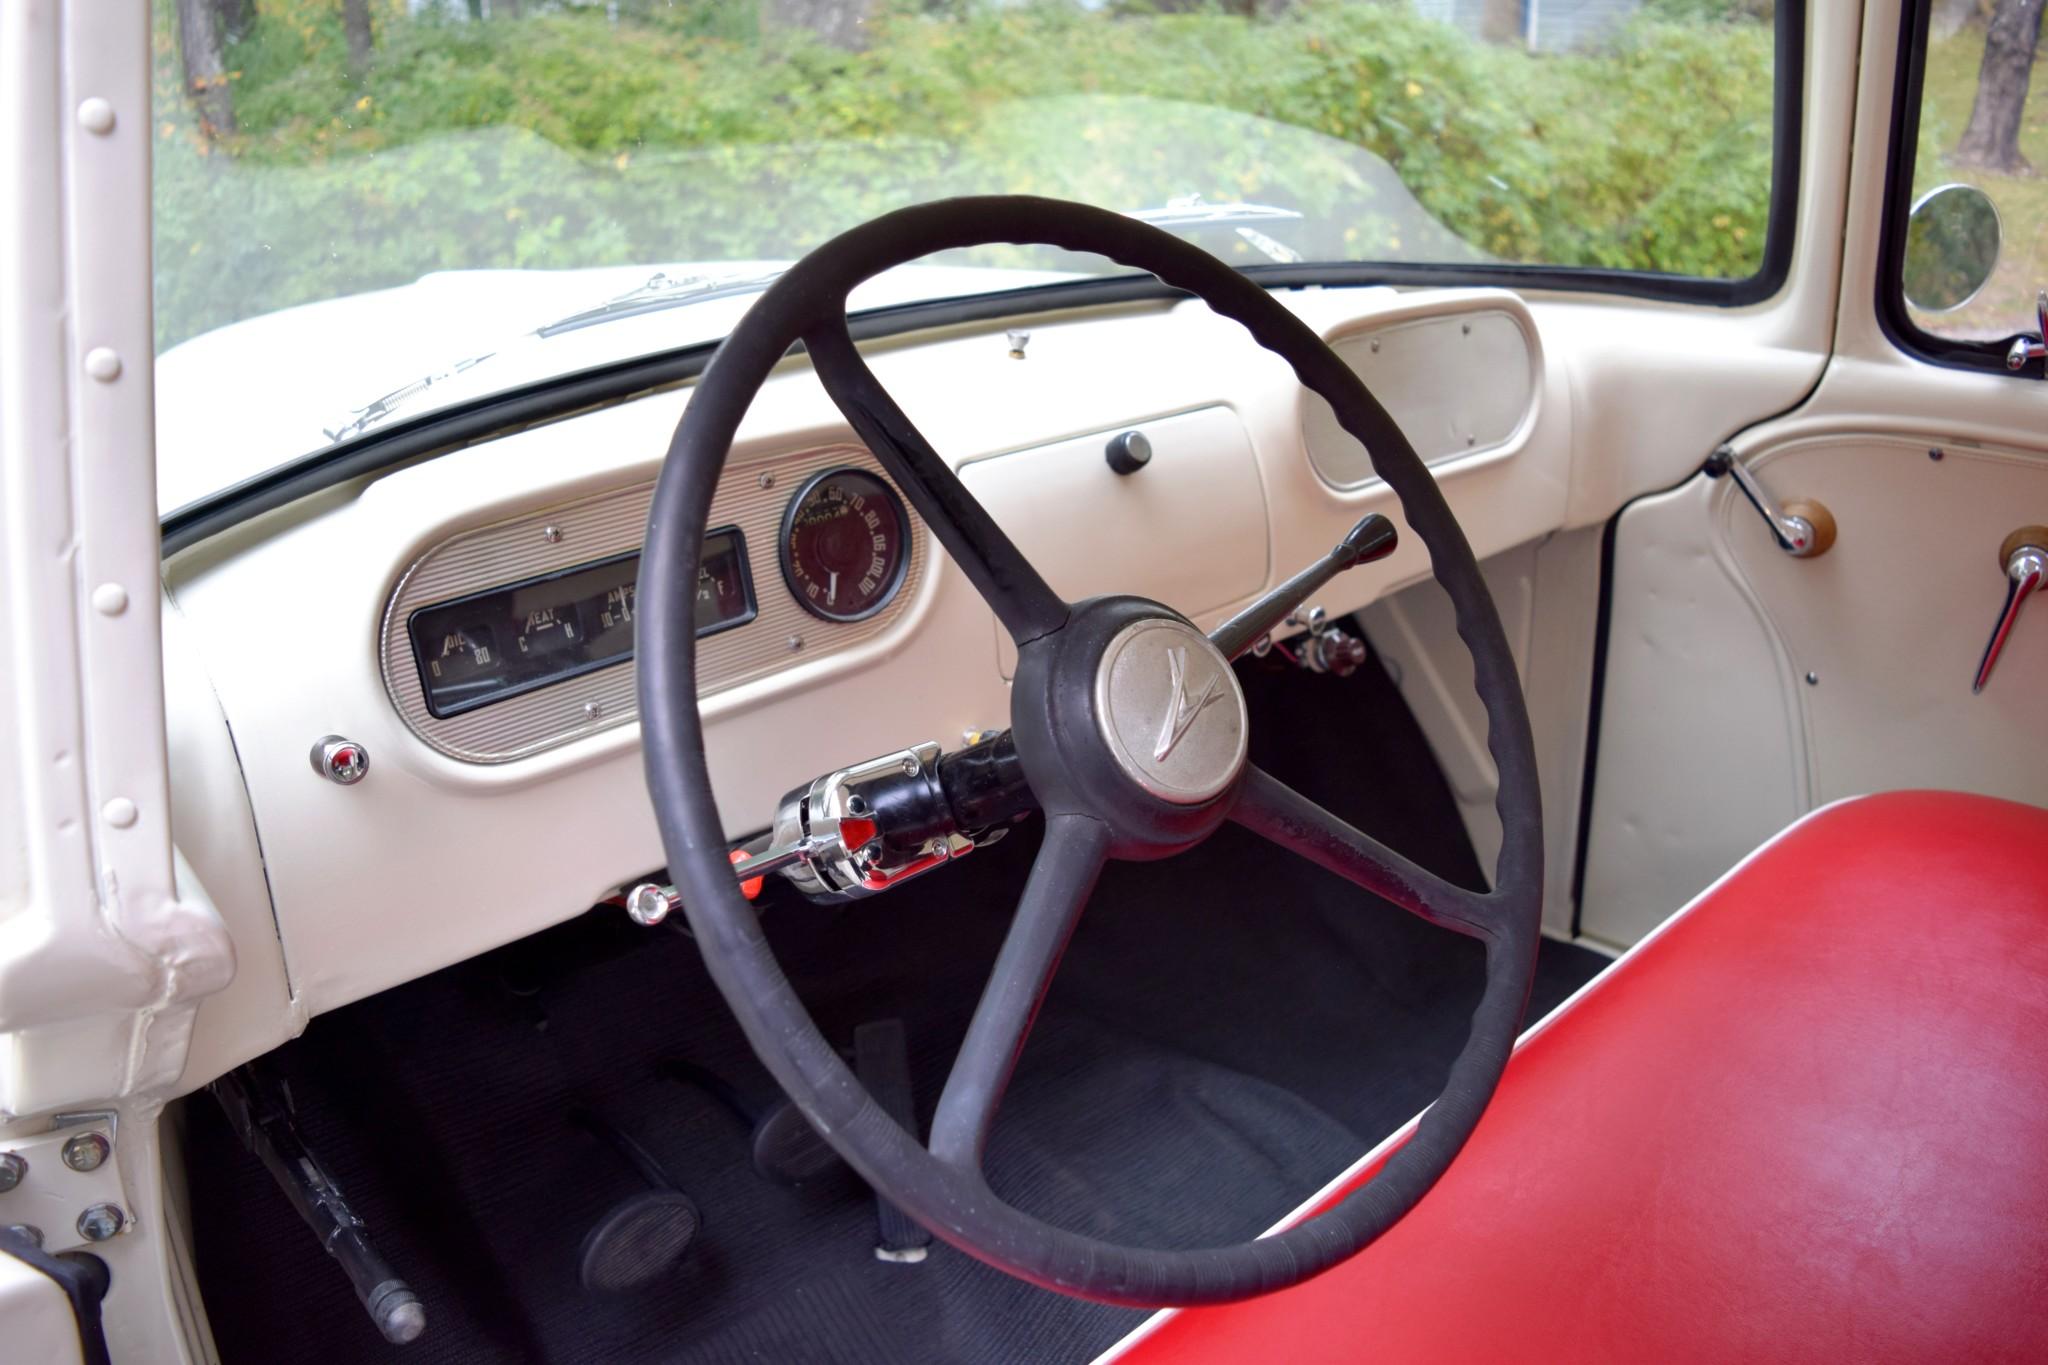 1957 Dodge D100 Sweptside steering wheel